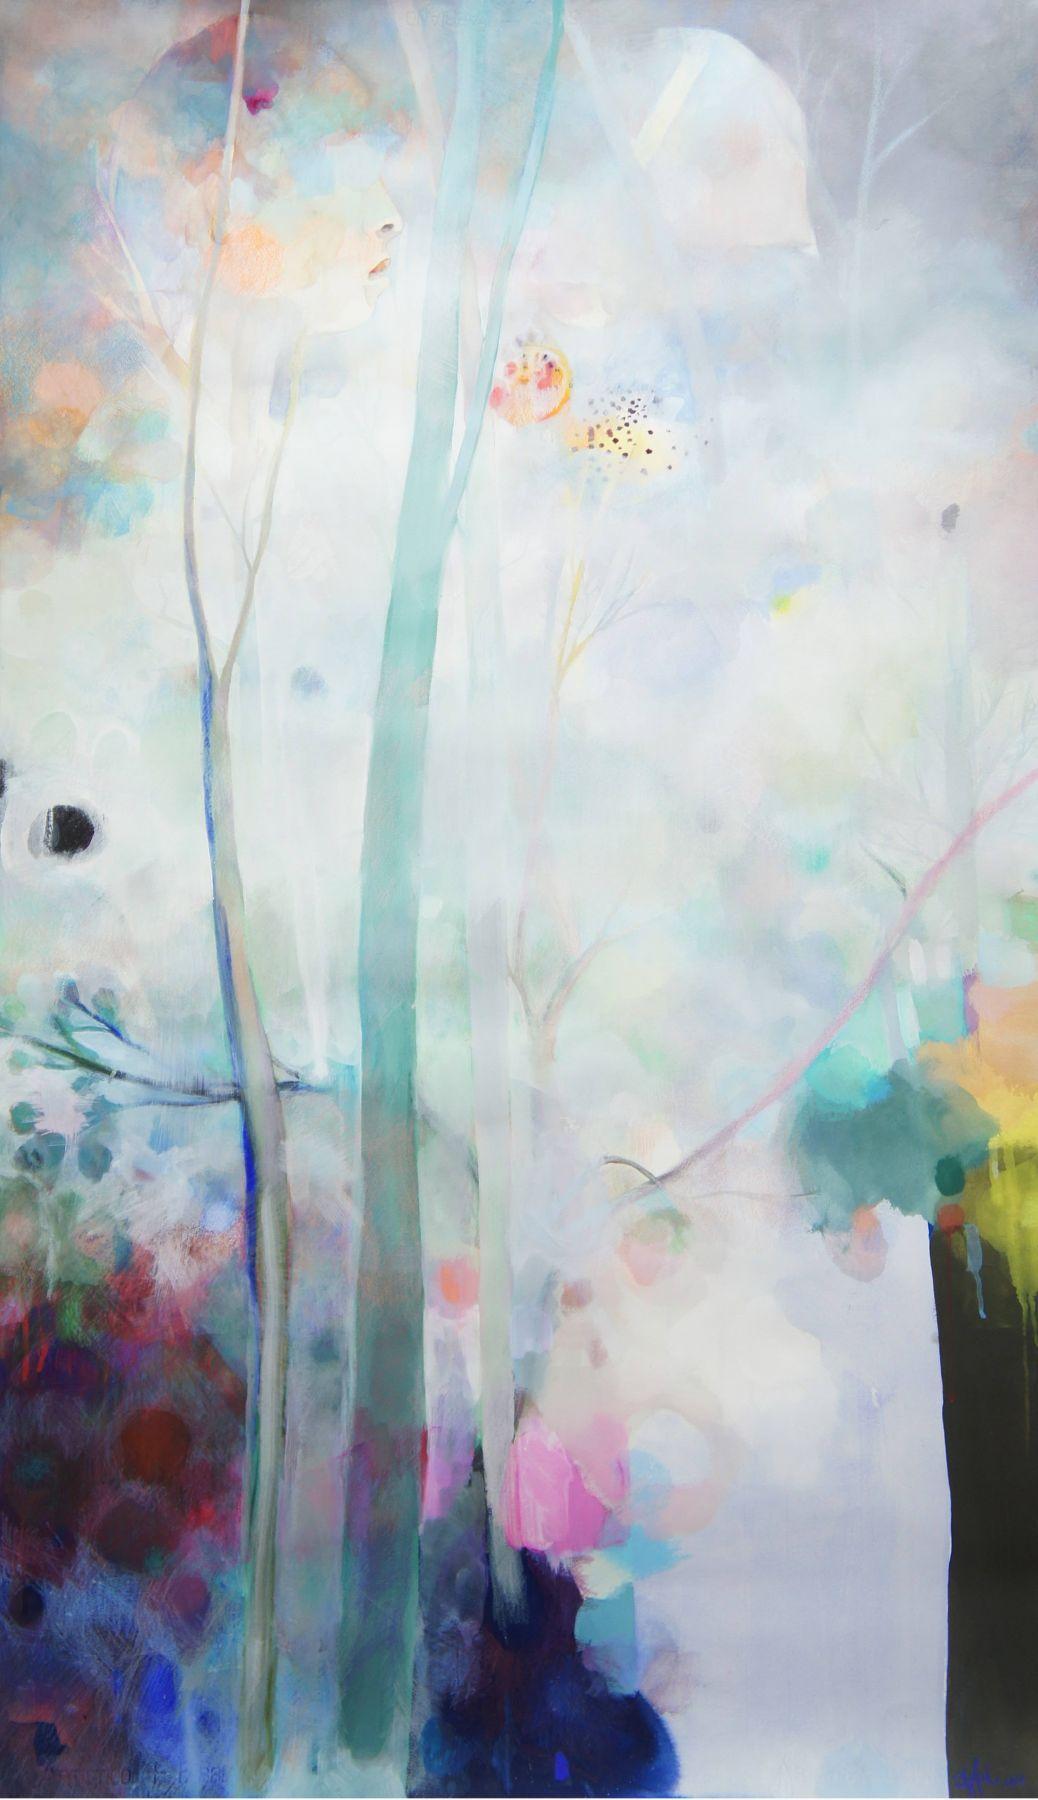 Amanda Humphries, Bush Bathing  watercolour, gouache and pencil on paper  143.5 cm x 84 cm  2018